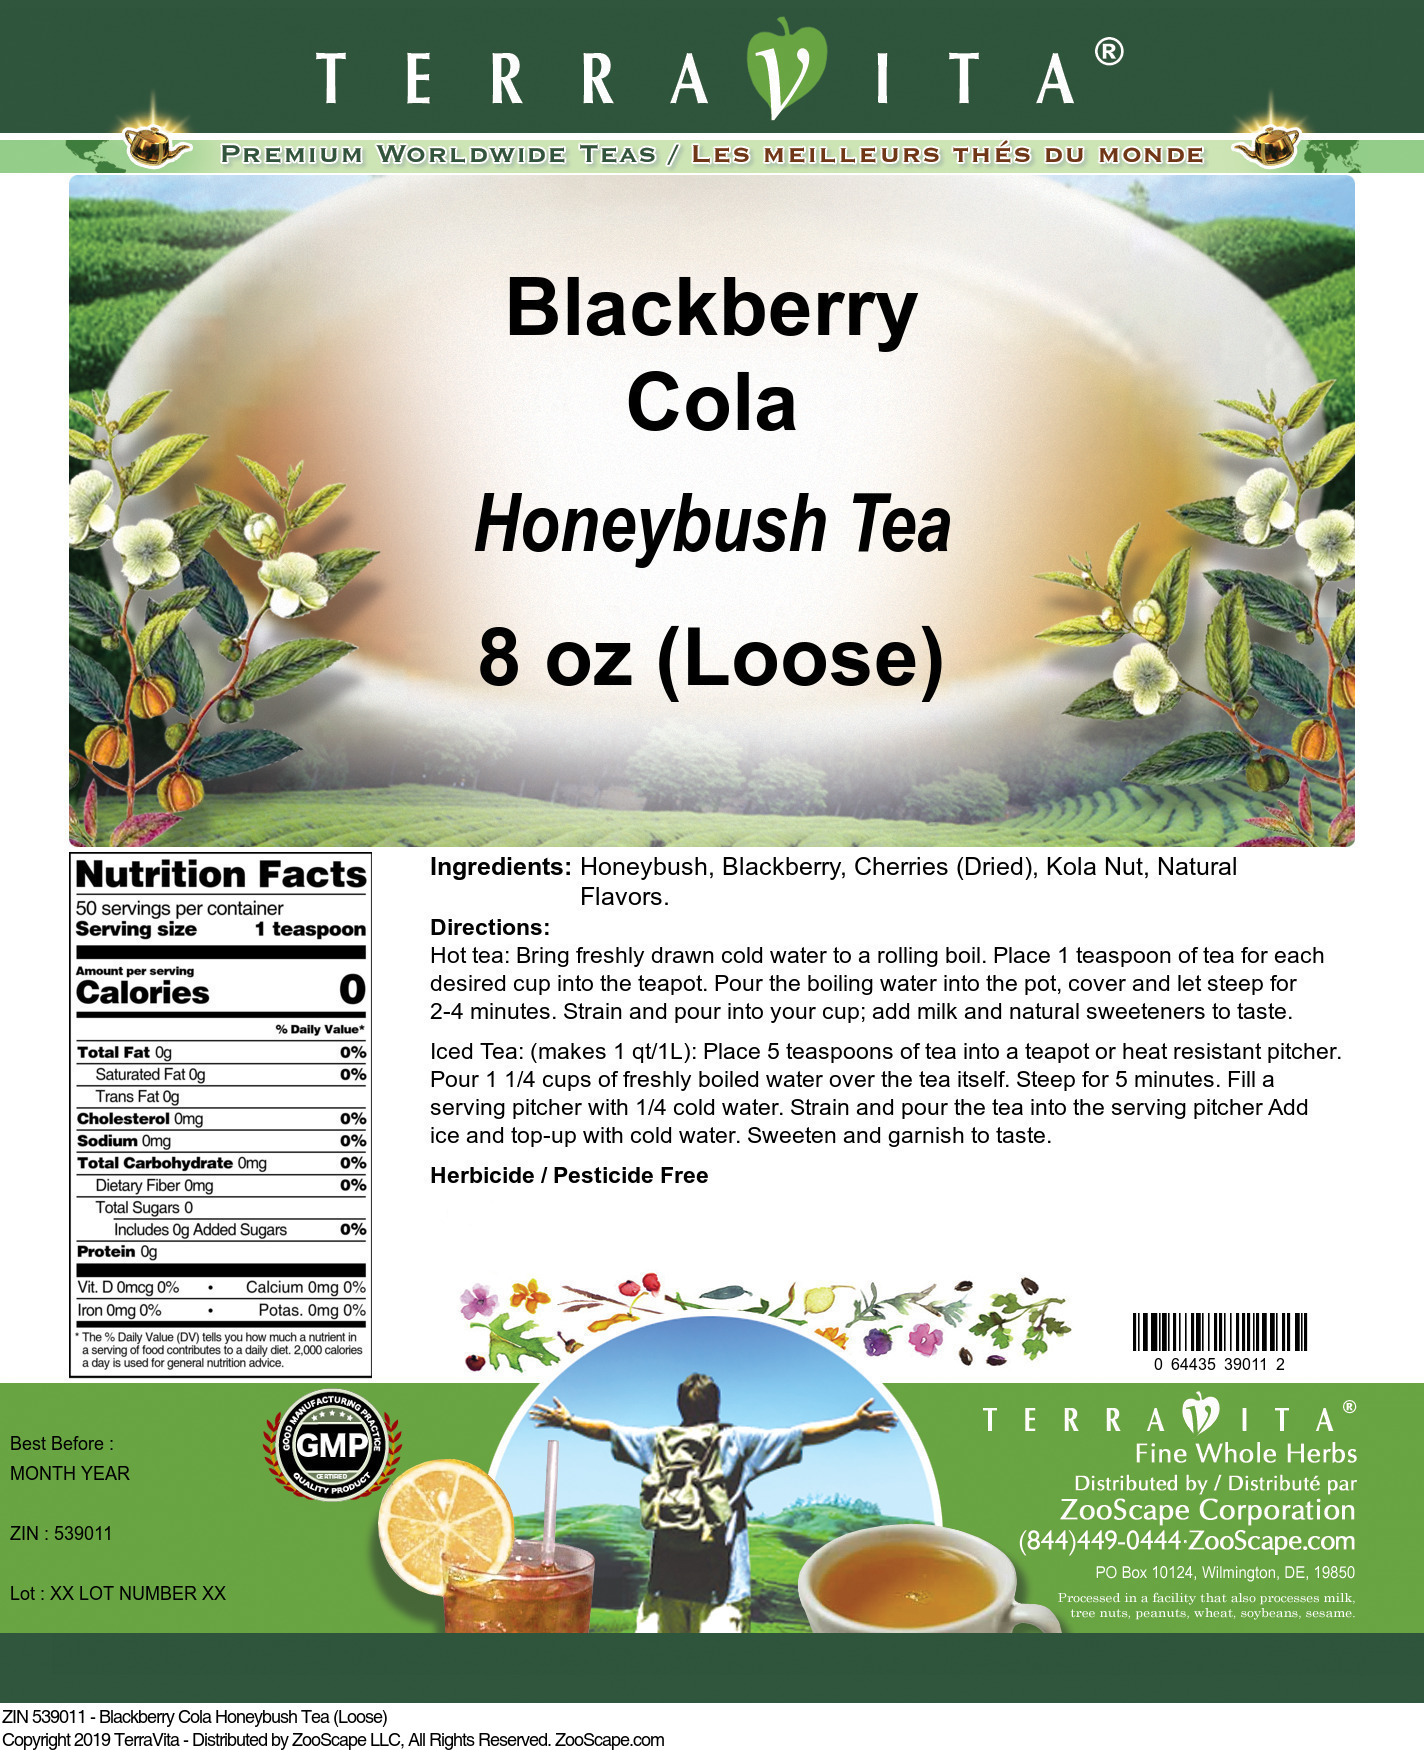 Blackberry Cola Honeybush Tea (Loose)